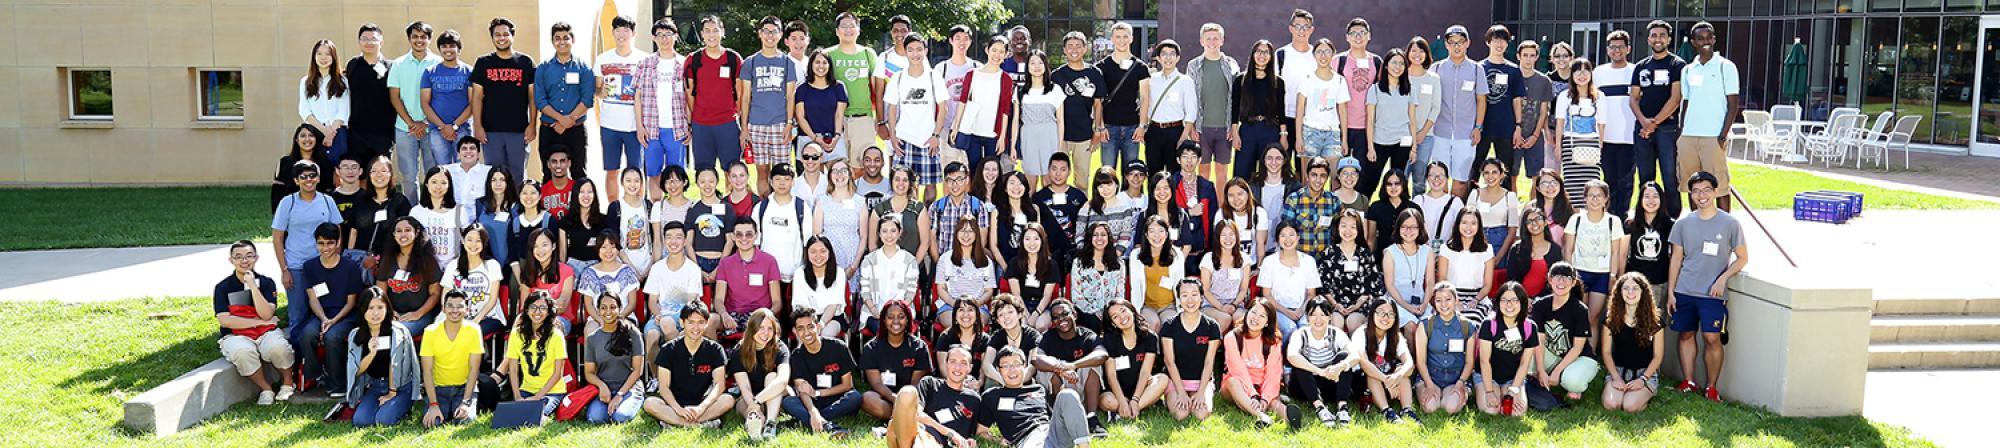 2016 Grinnell College International Pre-Orientation Program participants